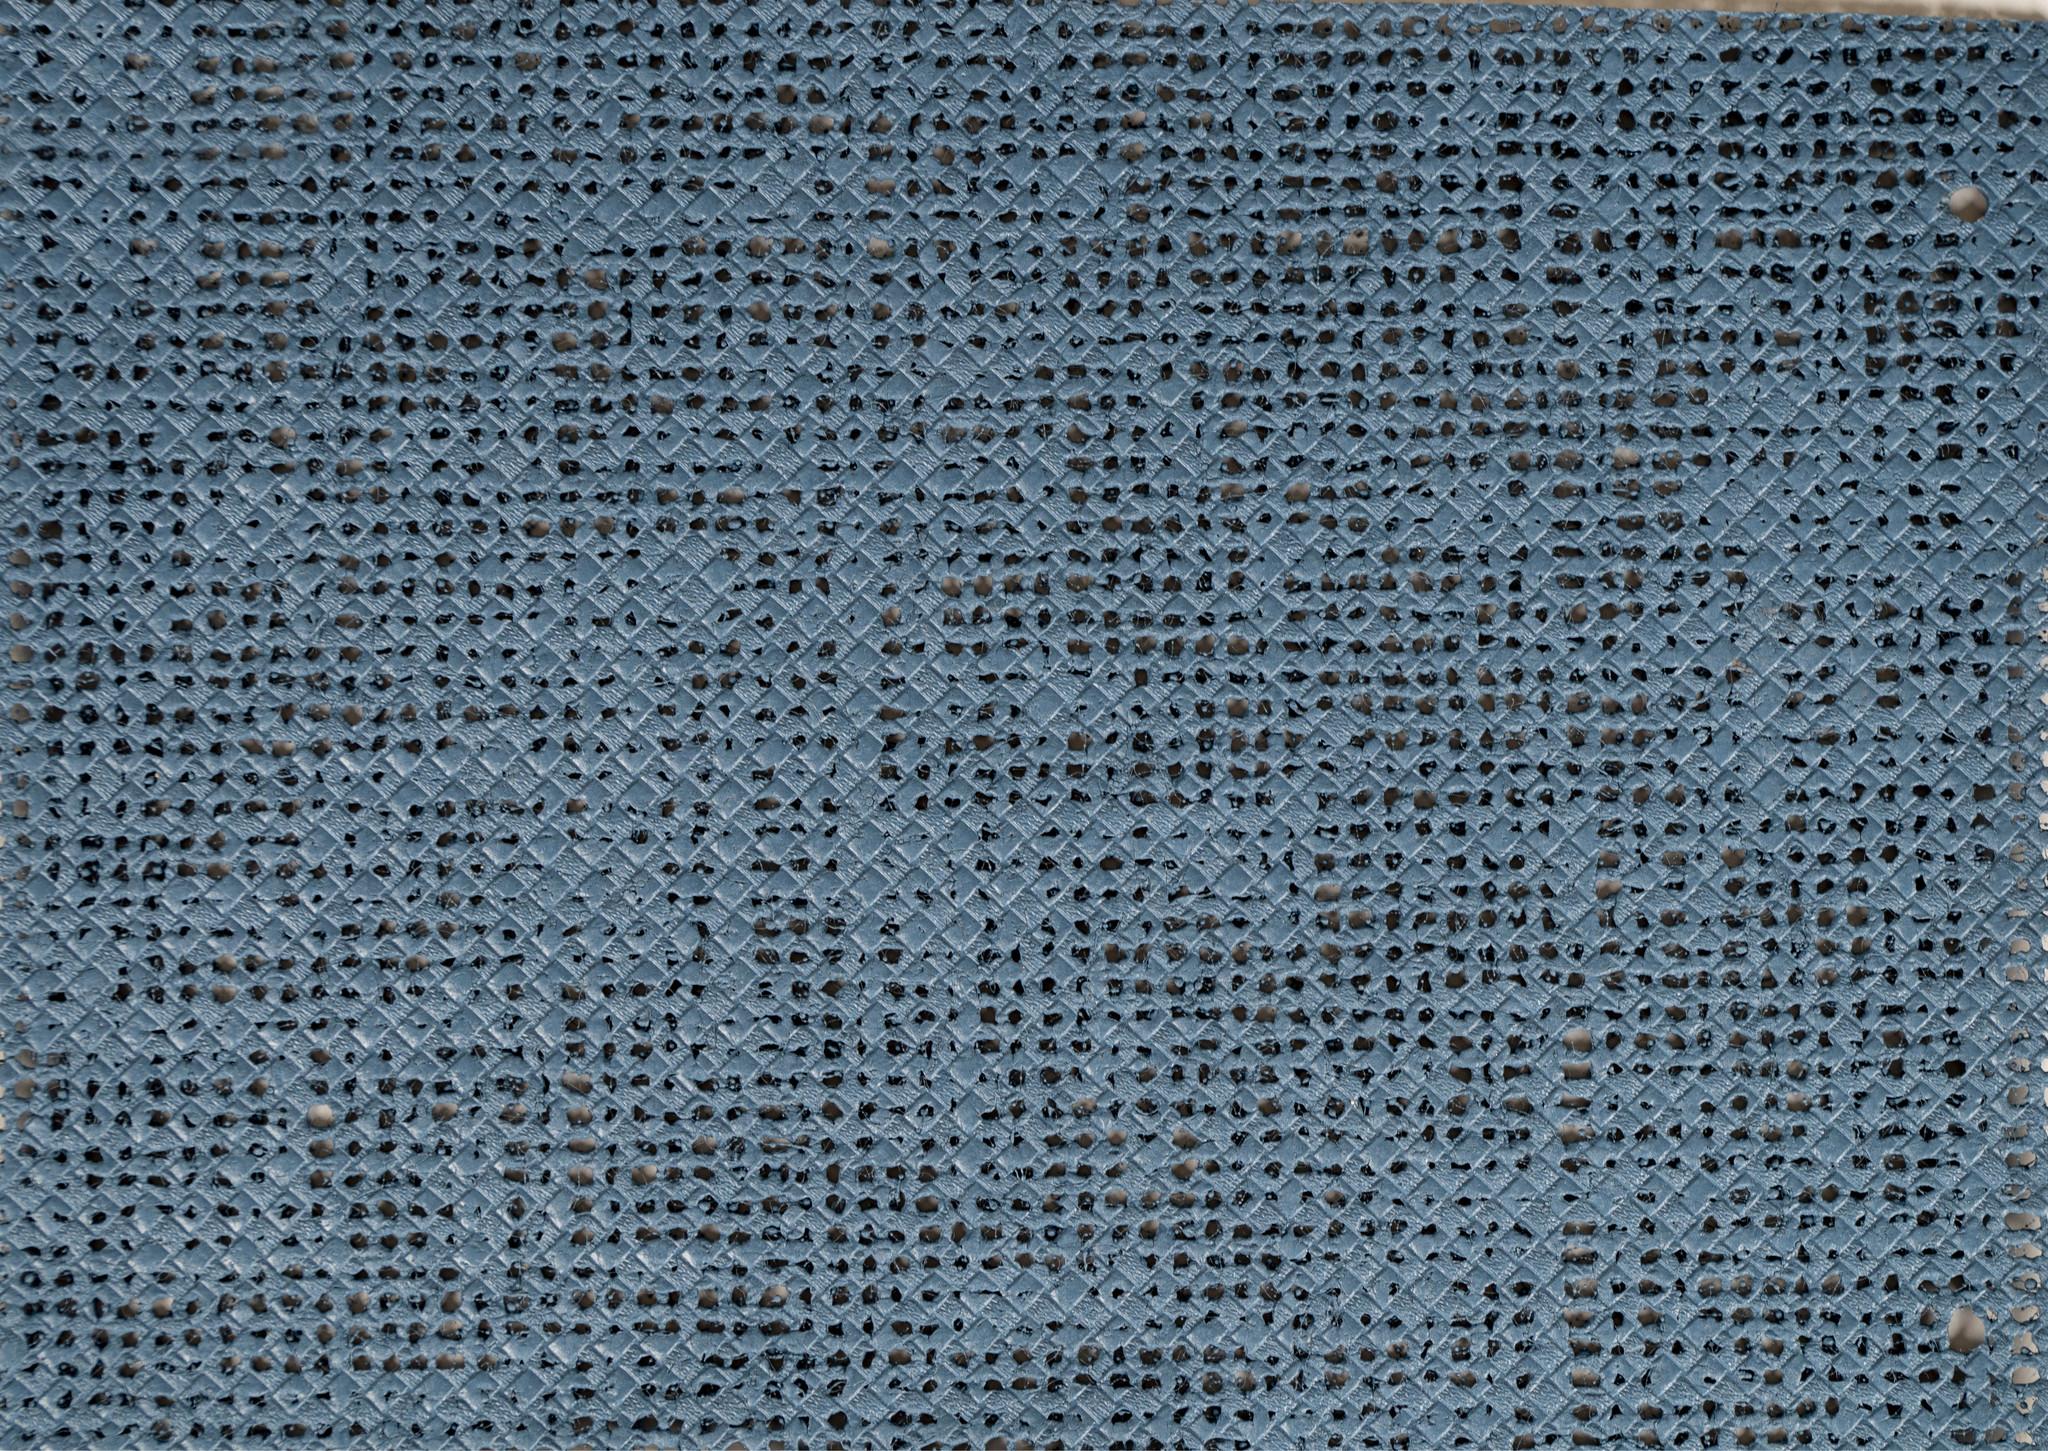 Aerotex Tenttapijt Blauw.Aerotex Aerotex Tenttapijt Blauw 2 5x5 Meter